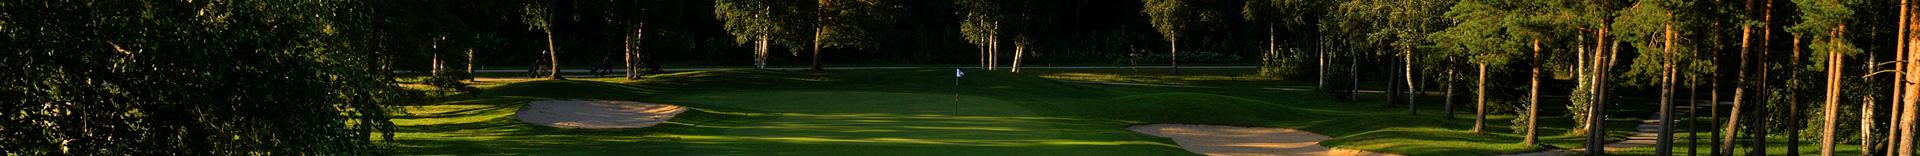 golfikeskus_vaike1